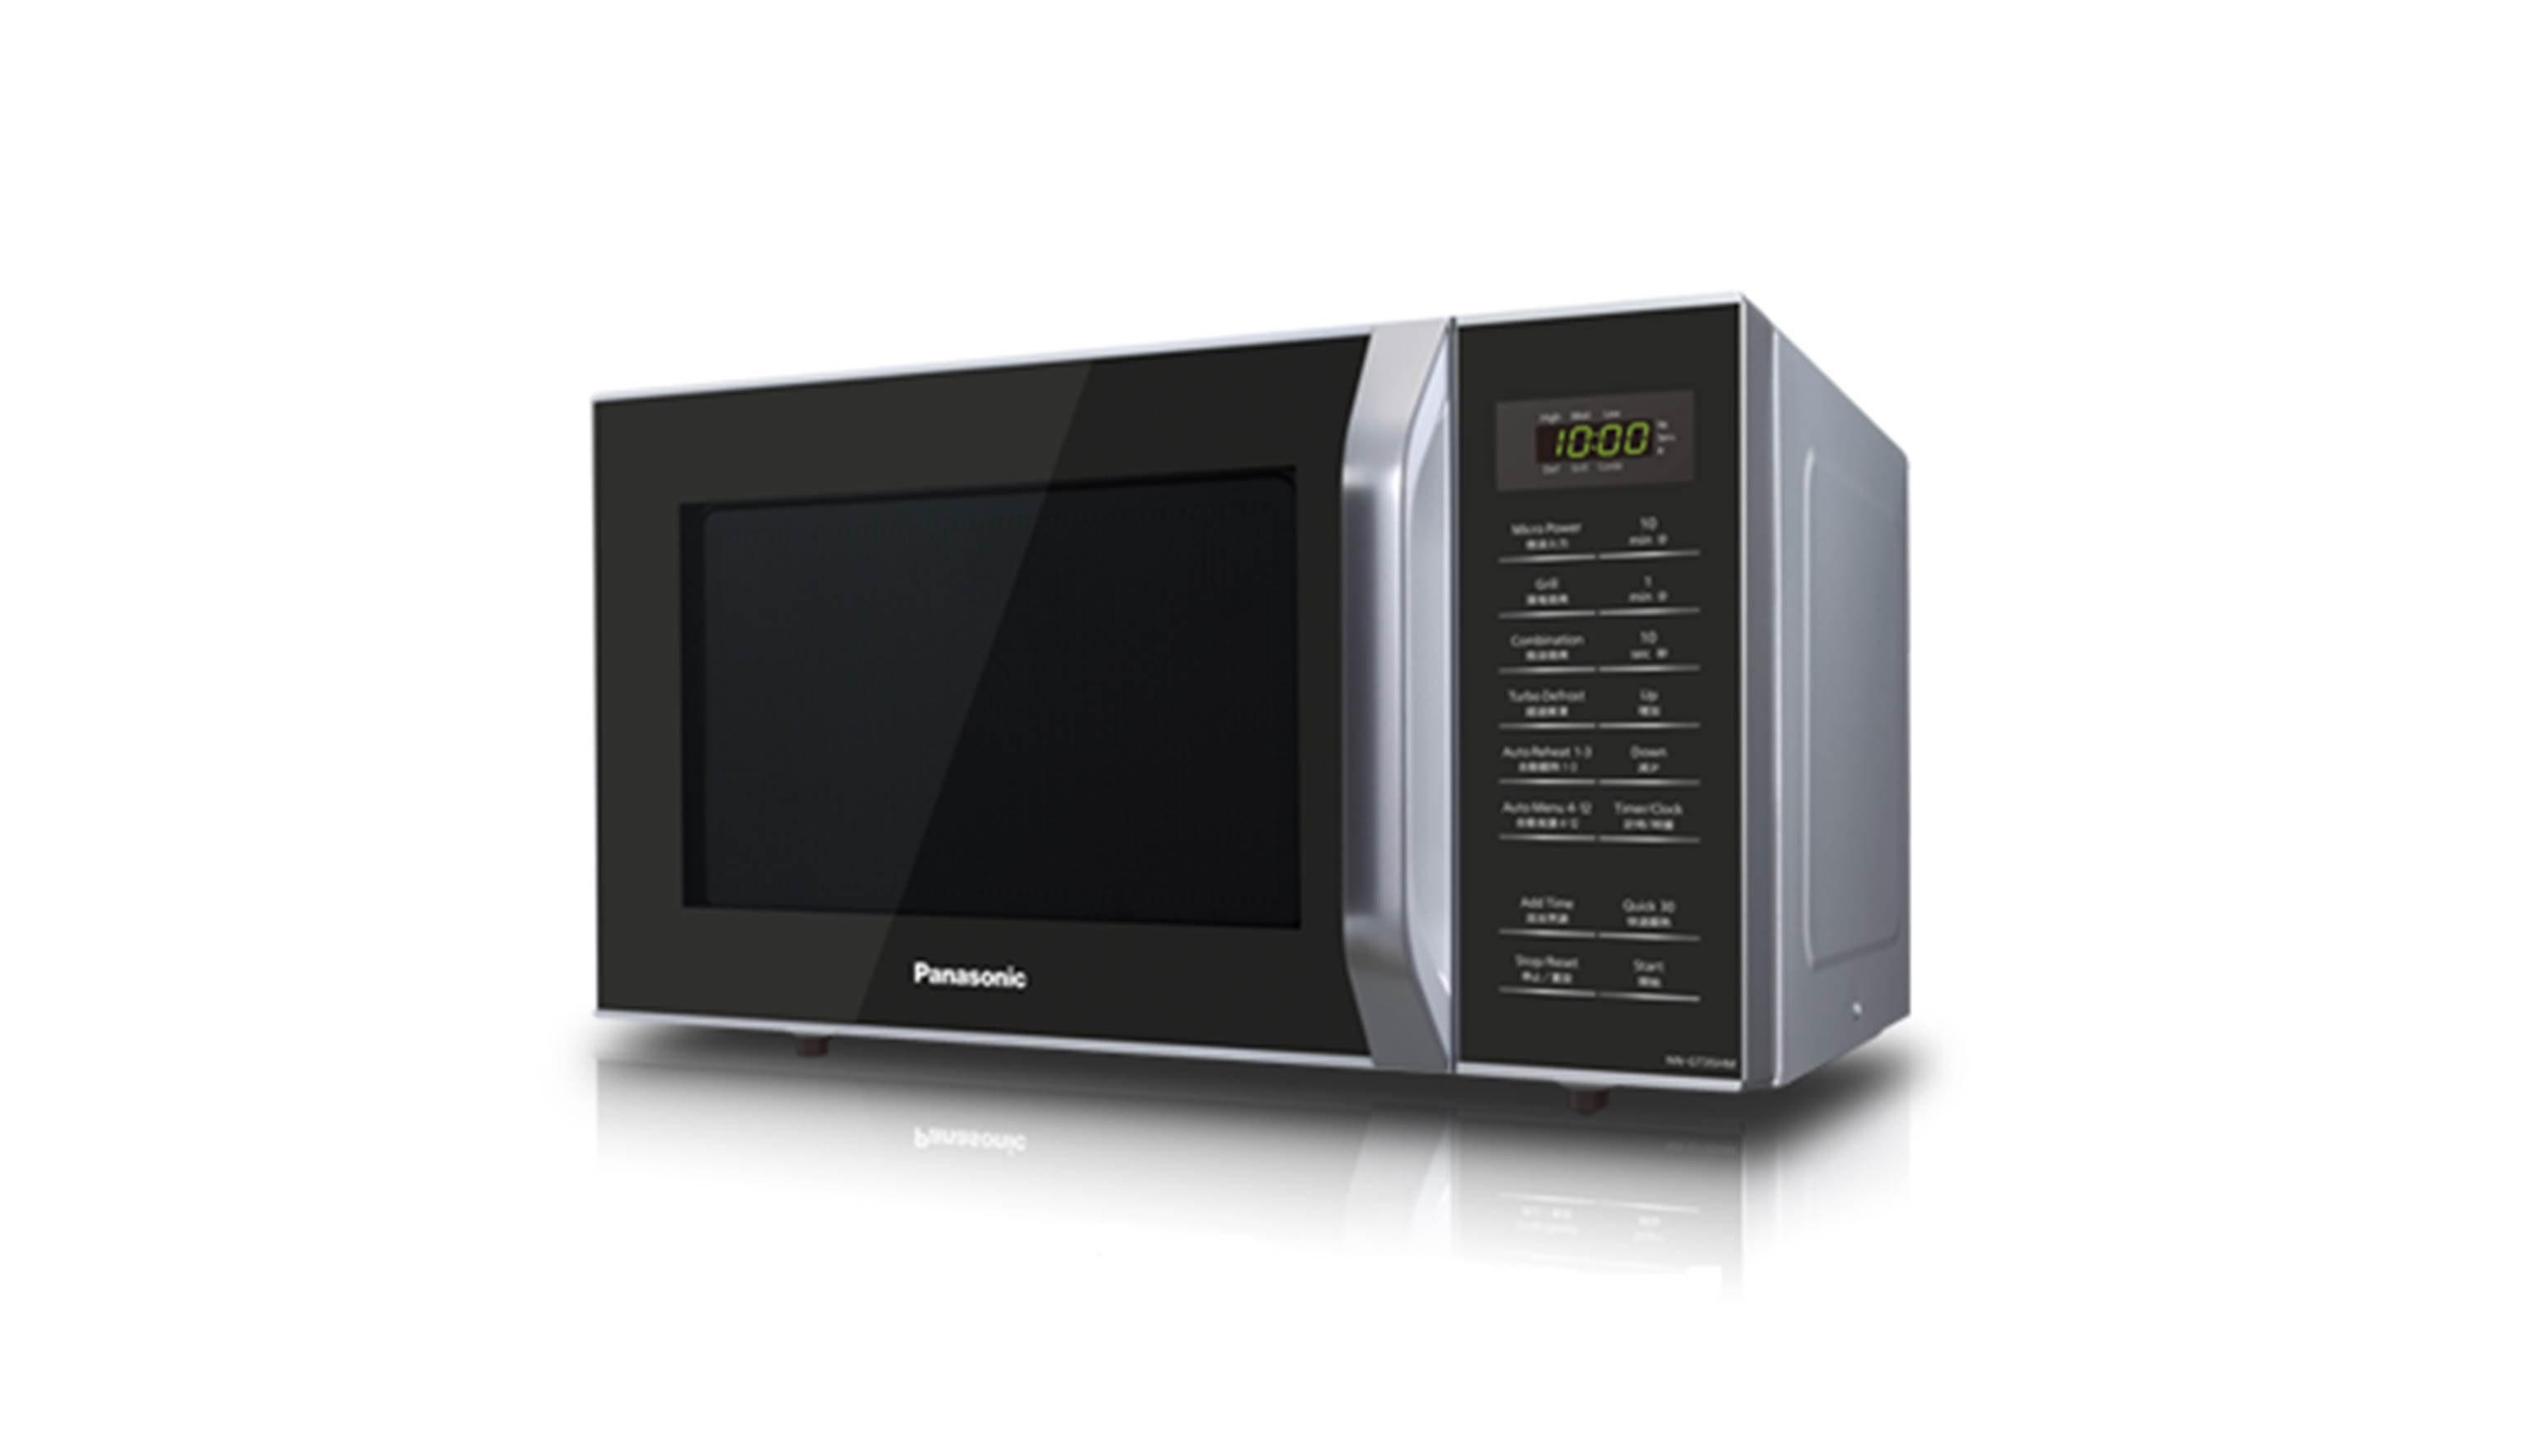 Panasonic Nn Gt35hmypq Microwave Oven Harvey Norman